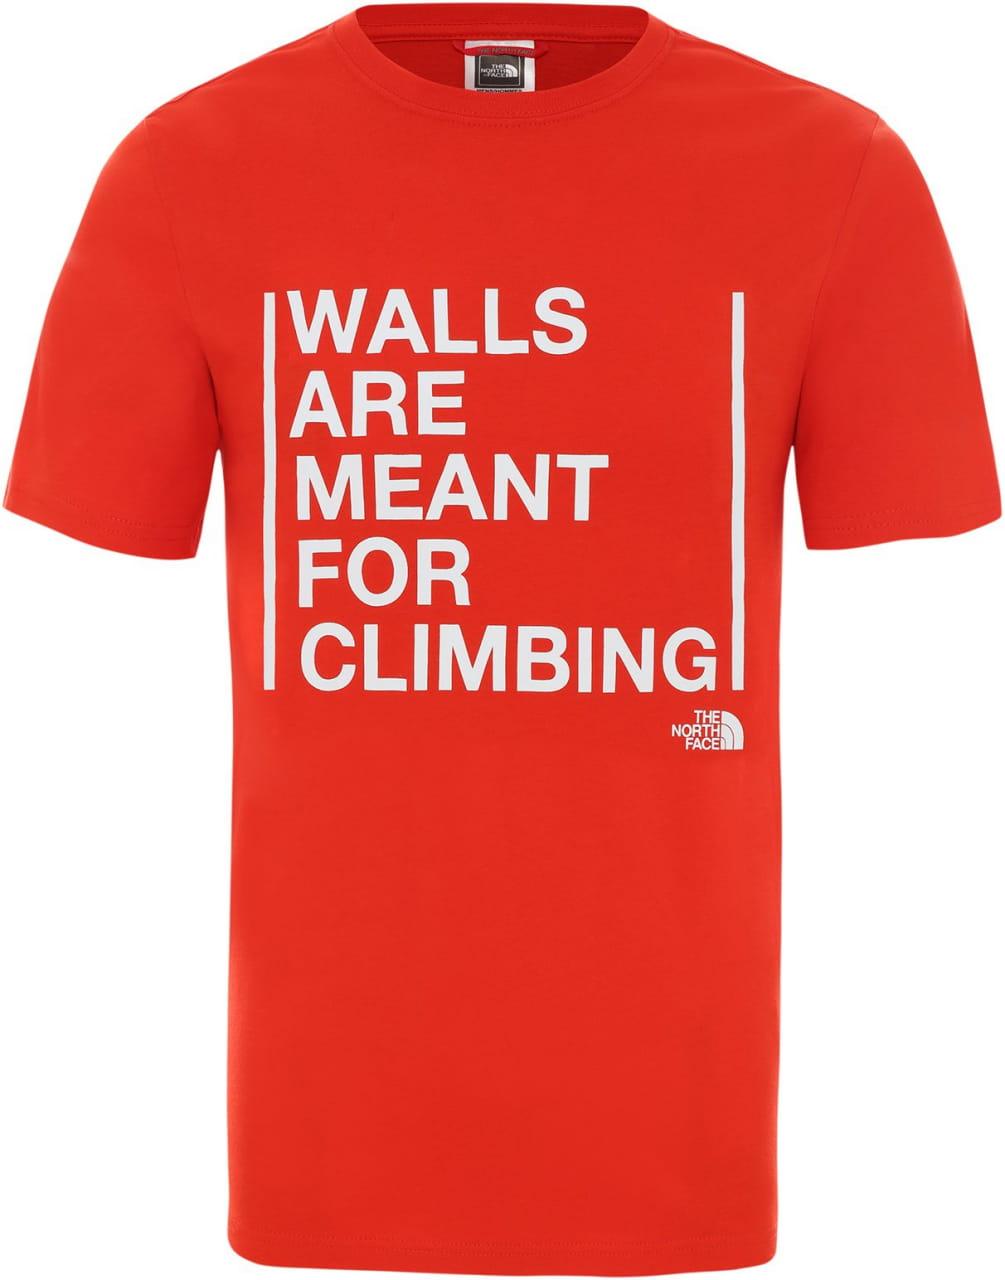 Pánské tričko The North Face Men's Walls Are For Climbing T-Shirt